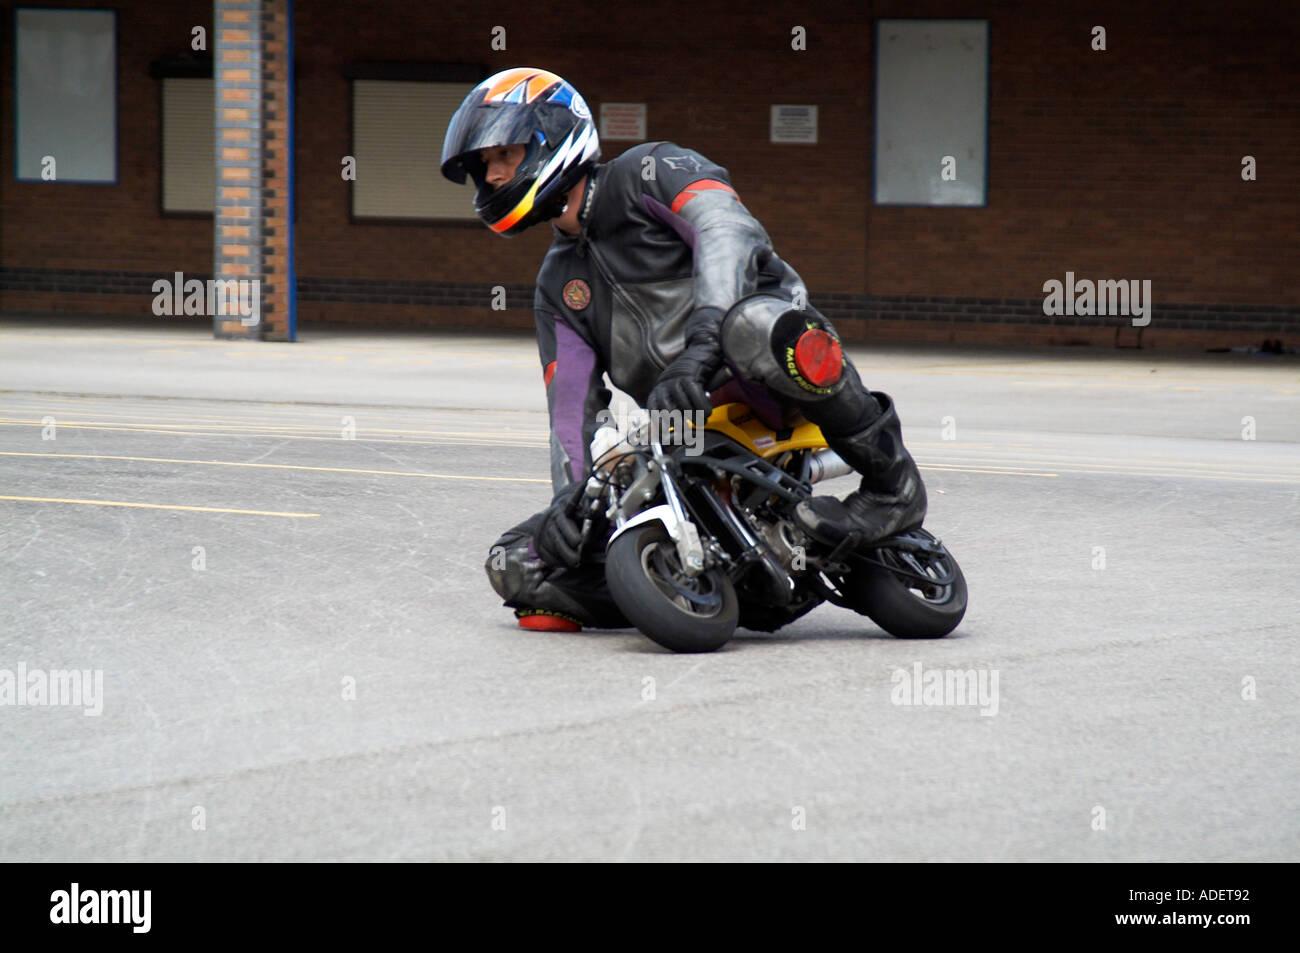 mini moto racing in a car park stock image